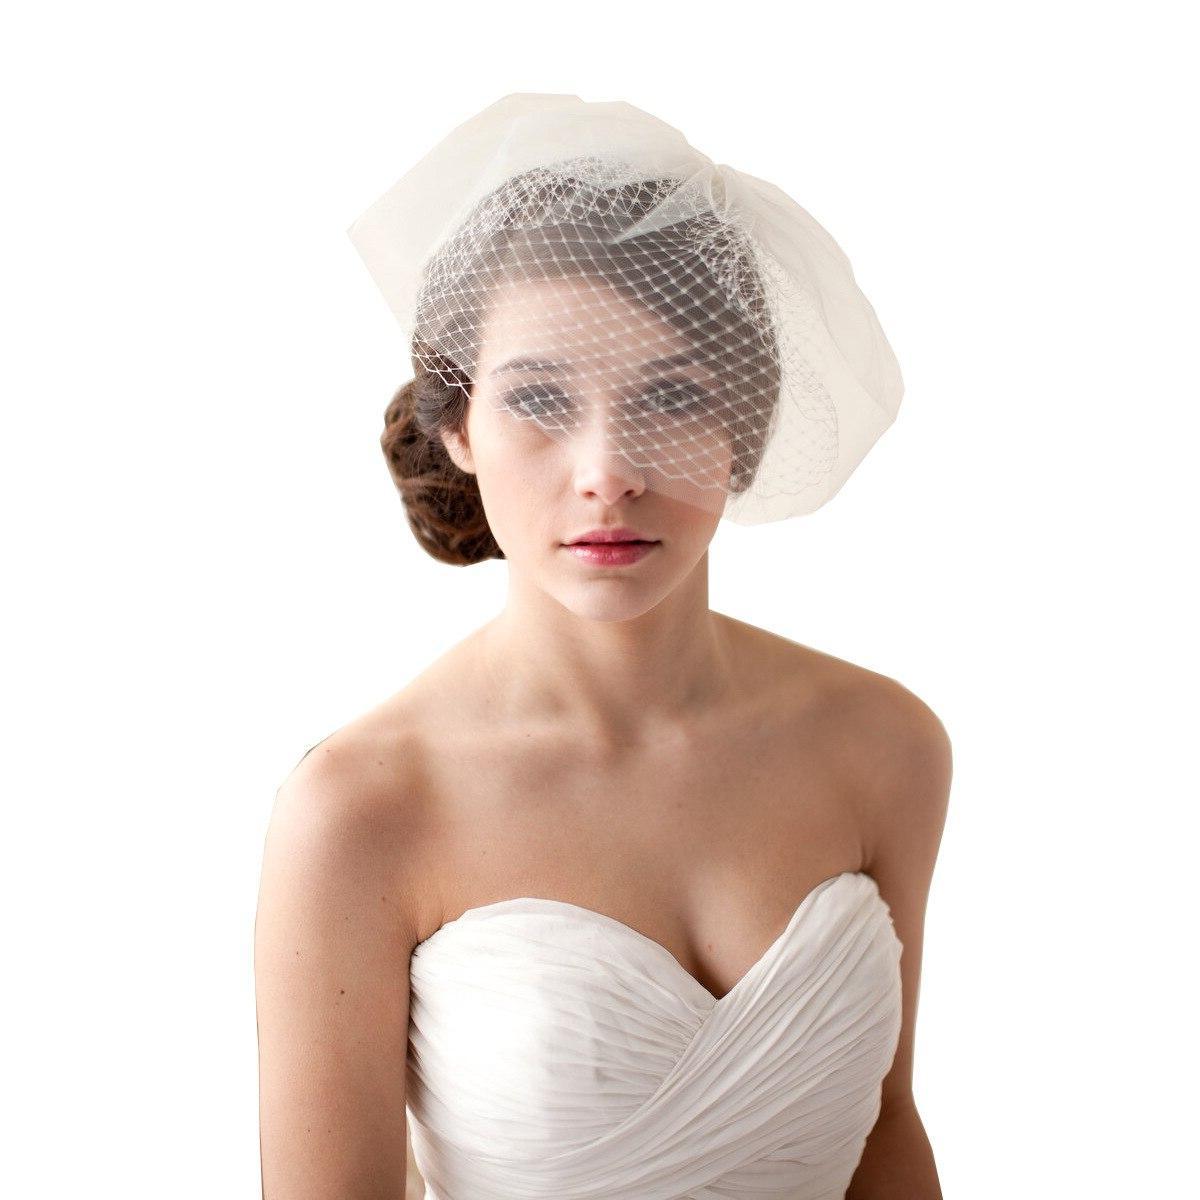 short wedding veil <font><b>Bird</b></font> <font><b>cage</b></font> Cut Edge Vail